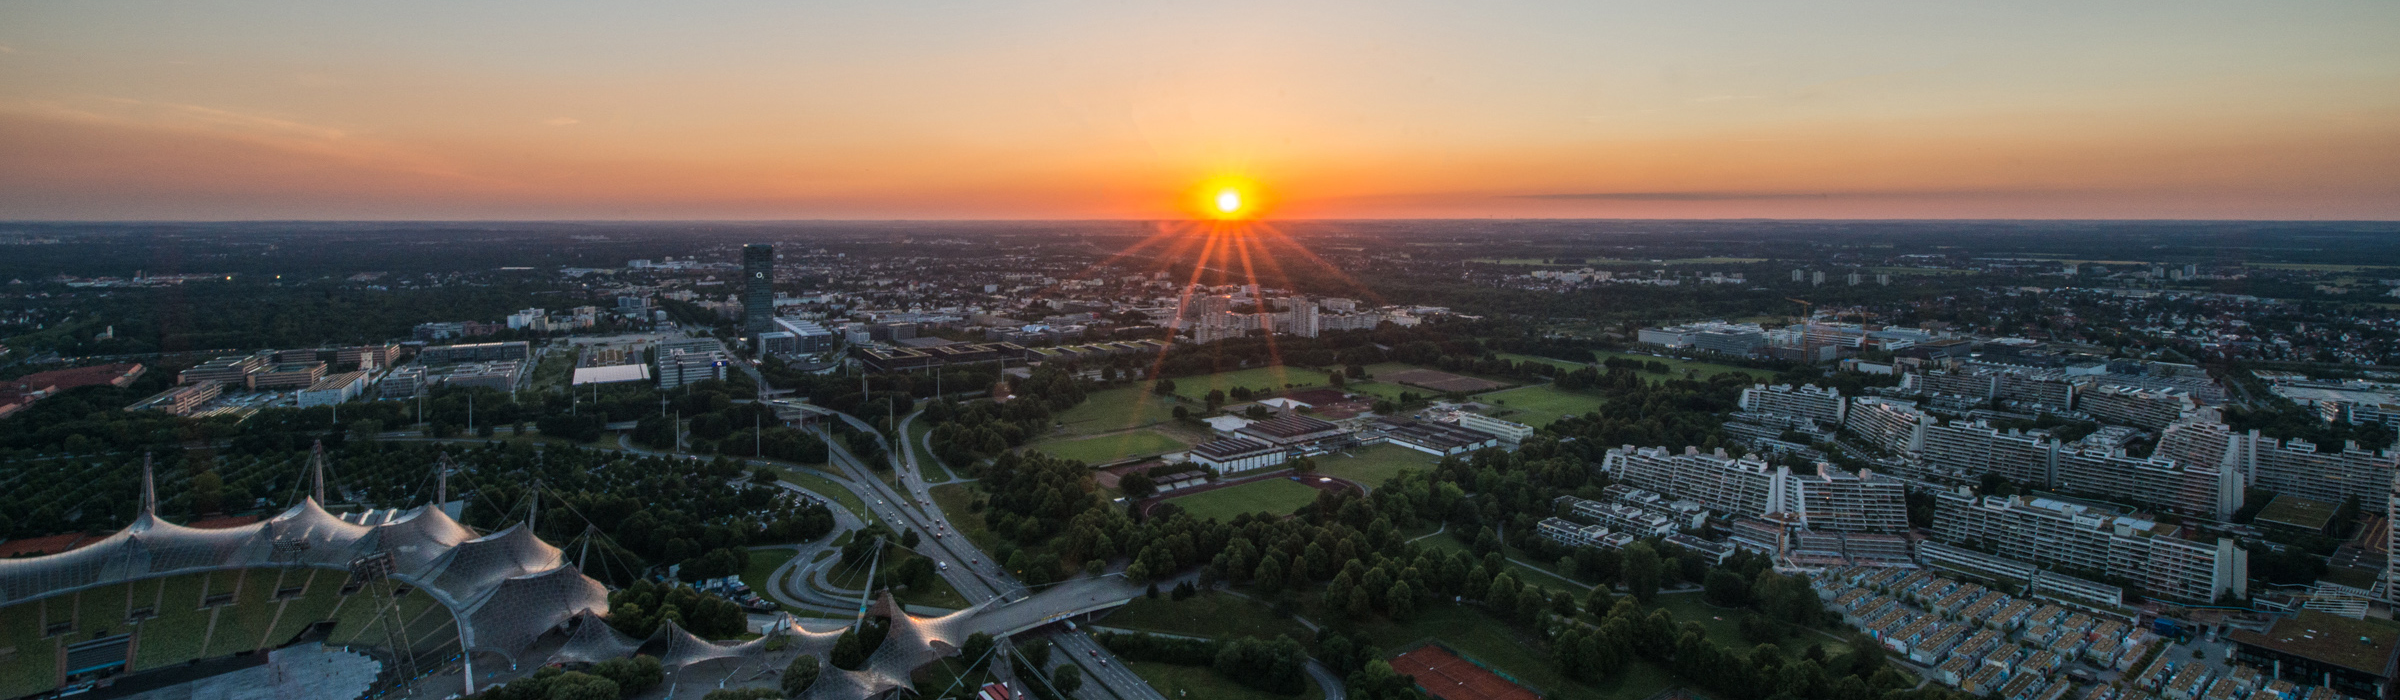 Sonnenuntergang am Olympiaturm